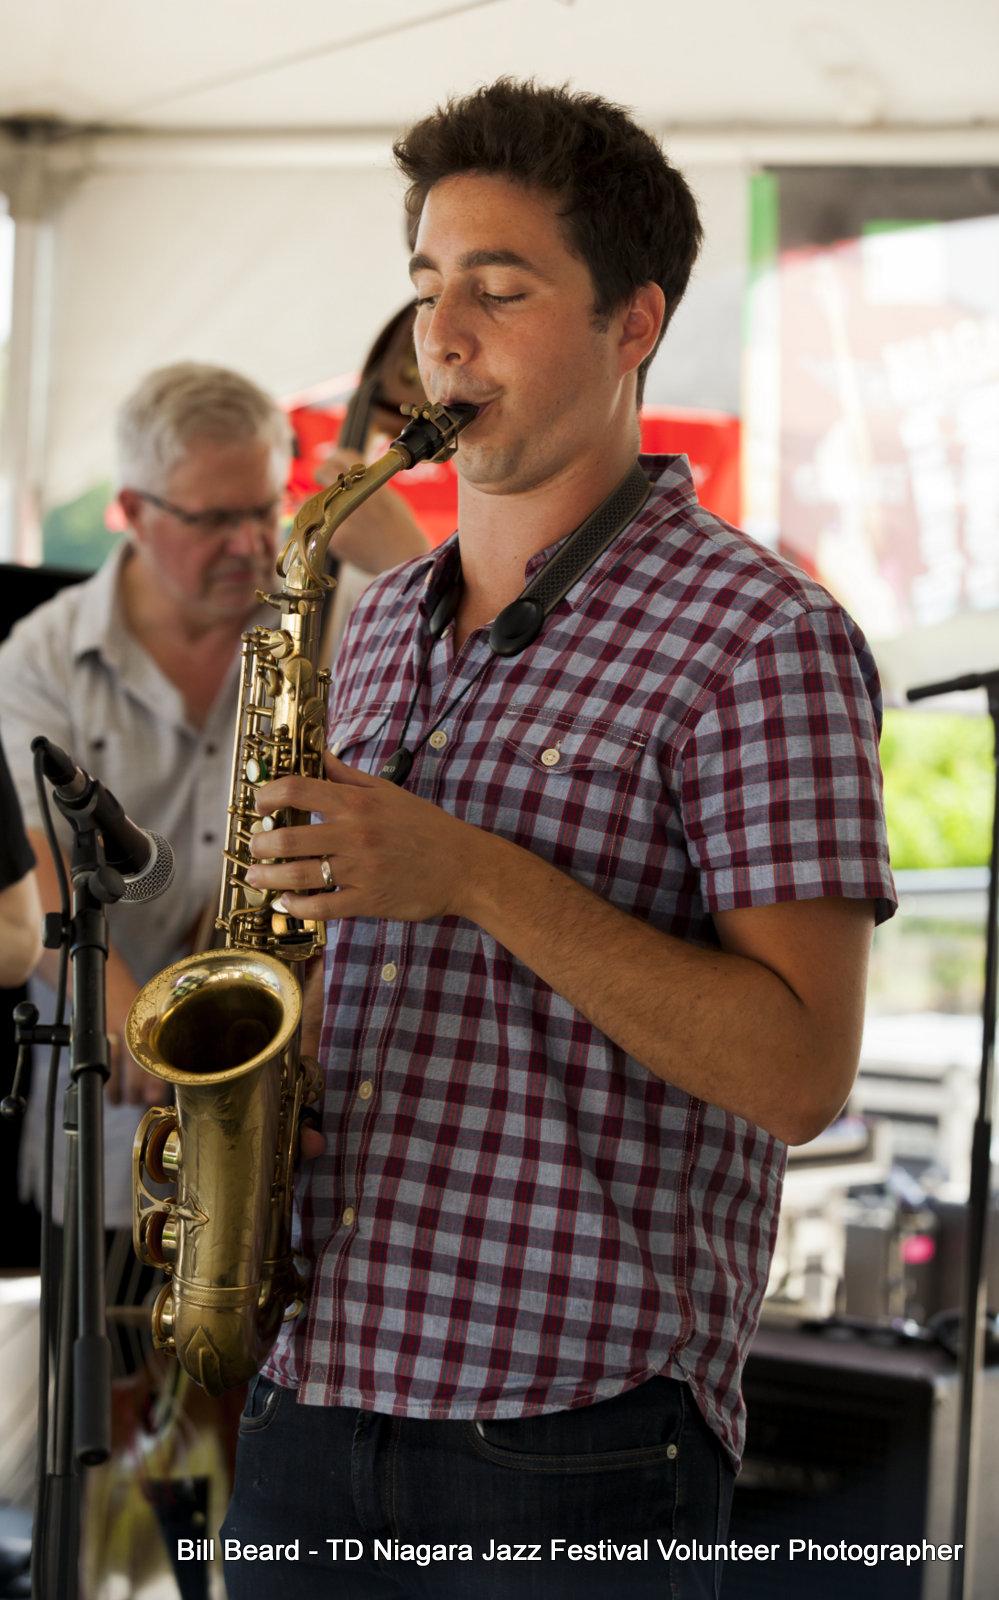 JAZZ on the RISE - Canada 150 Celebration - Megalomaniac Winery - Tribute to Moe Koffman featuring Jake Koffman (Saxophone) Sunday, July 30th, 2017. Photo: Bill Beard